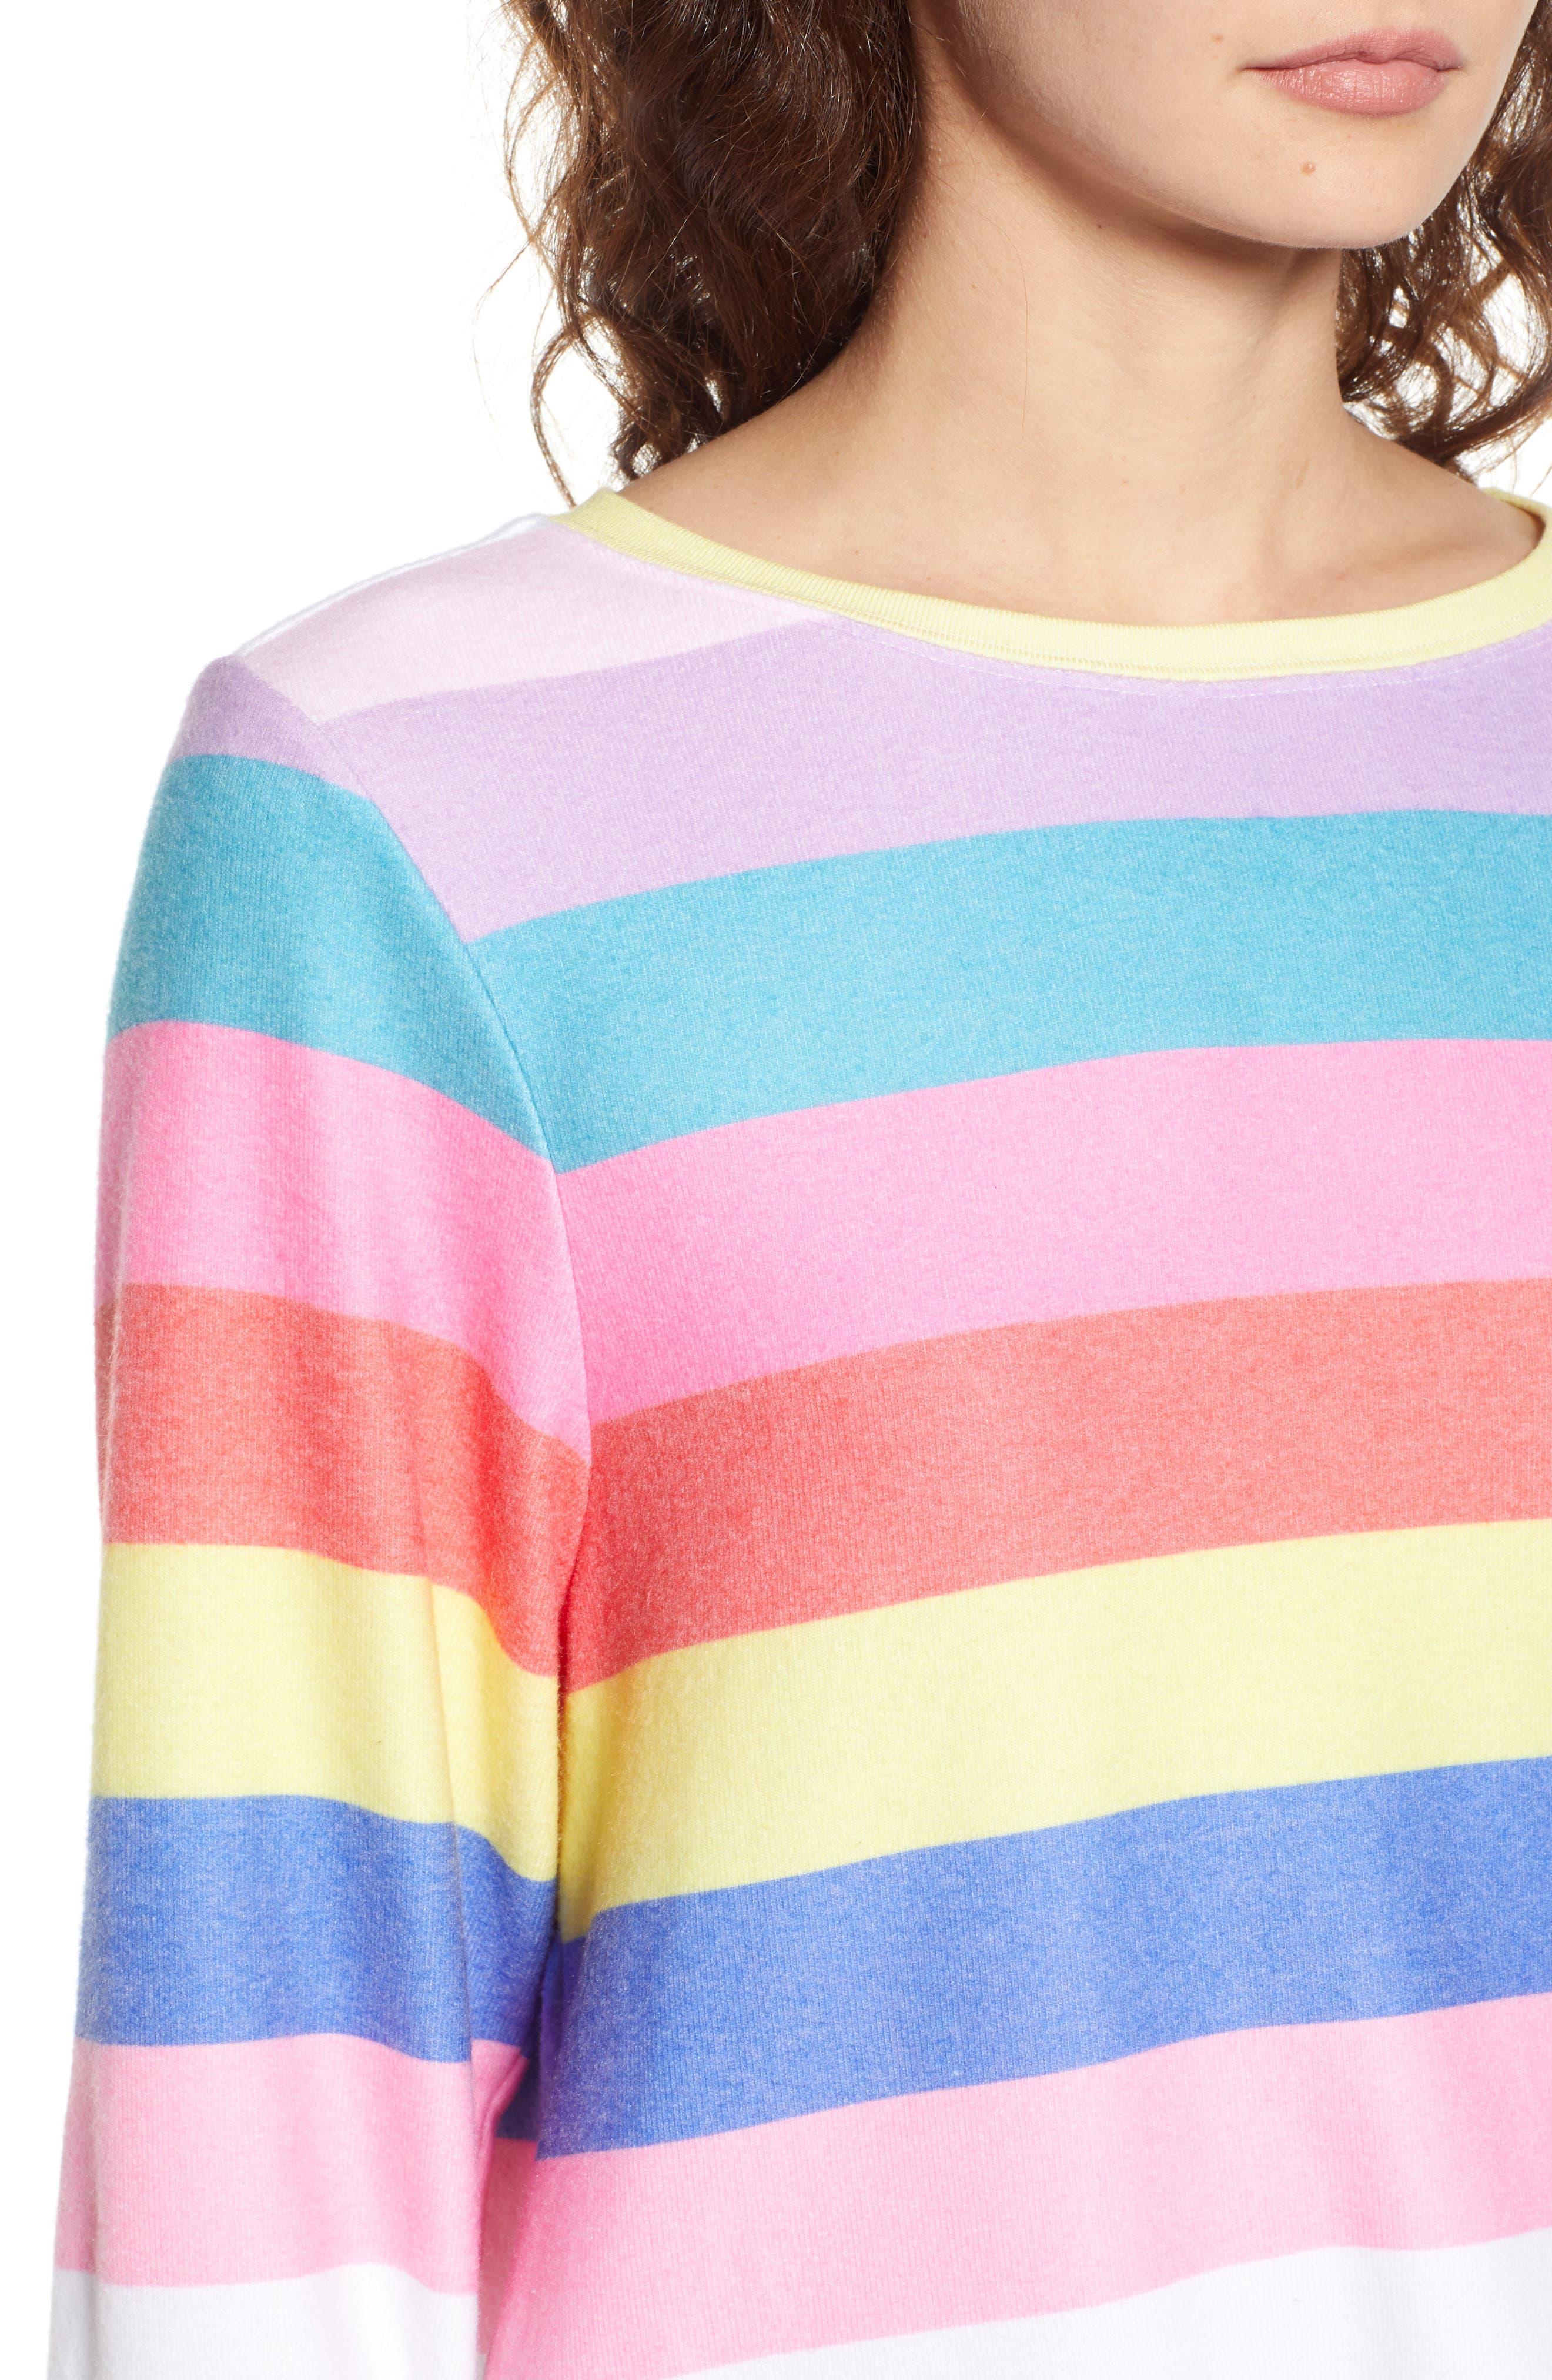 Castaway Roadtrip Sweatshirt,                             Alternate thumbnail 4, color,                             Multi Colored